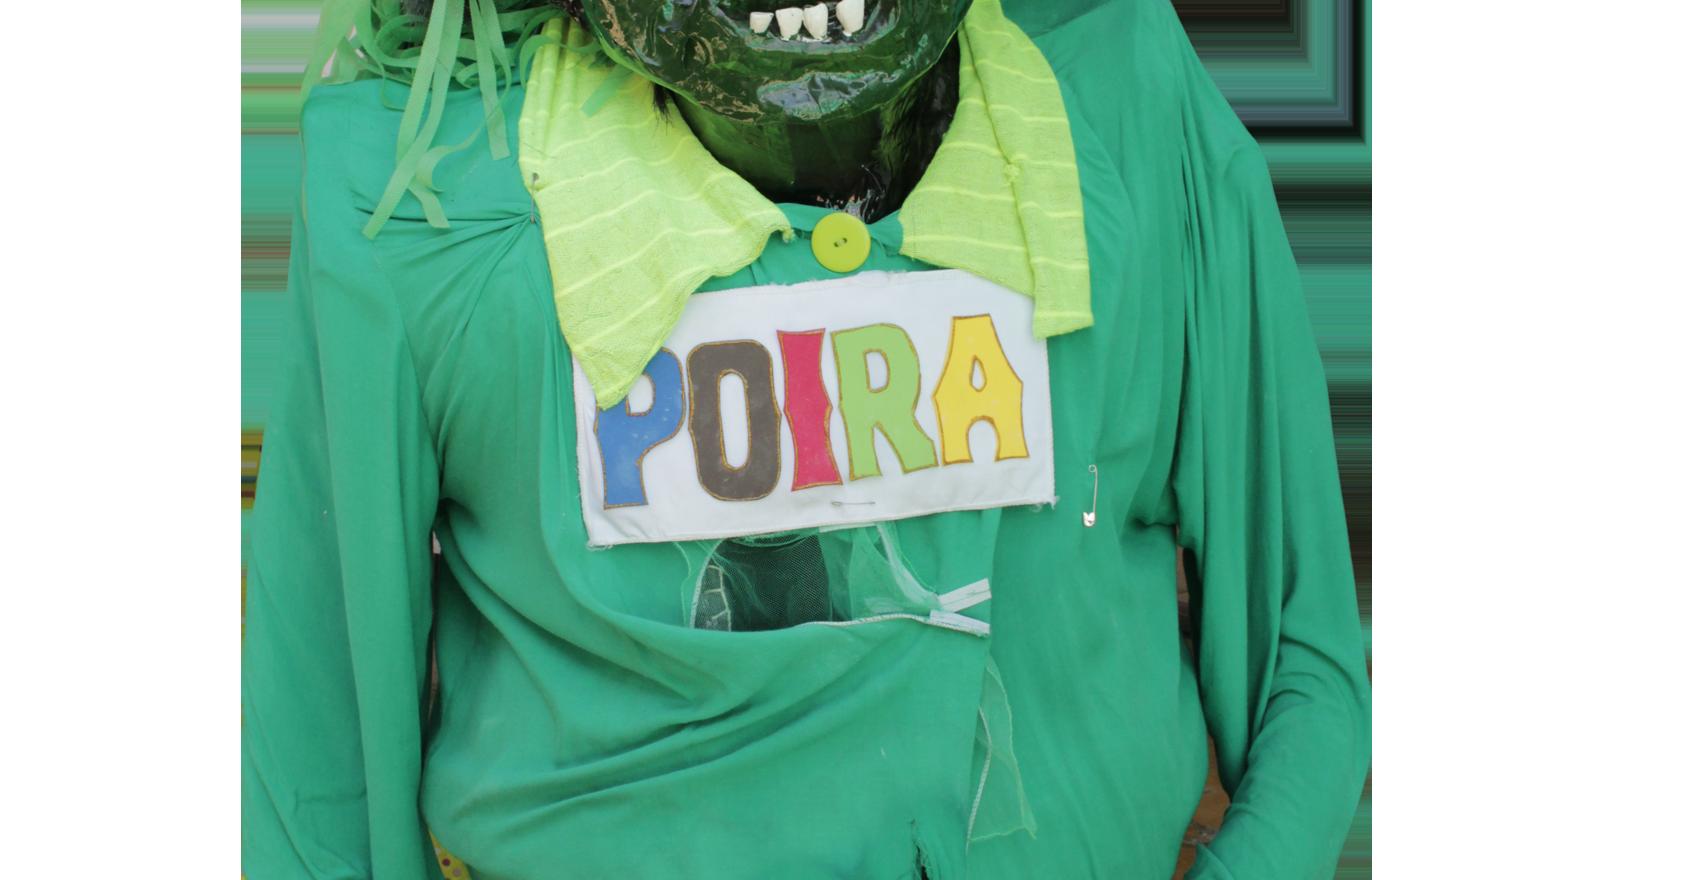 POIRA ESCUELA BANYO PNG.png